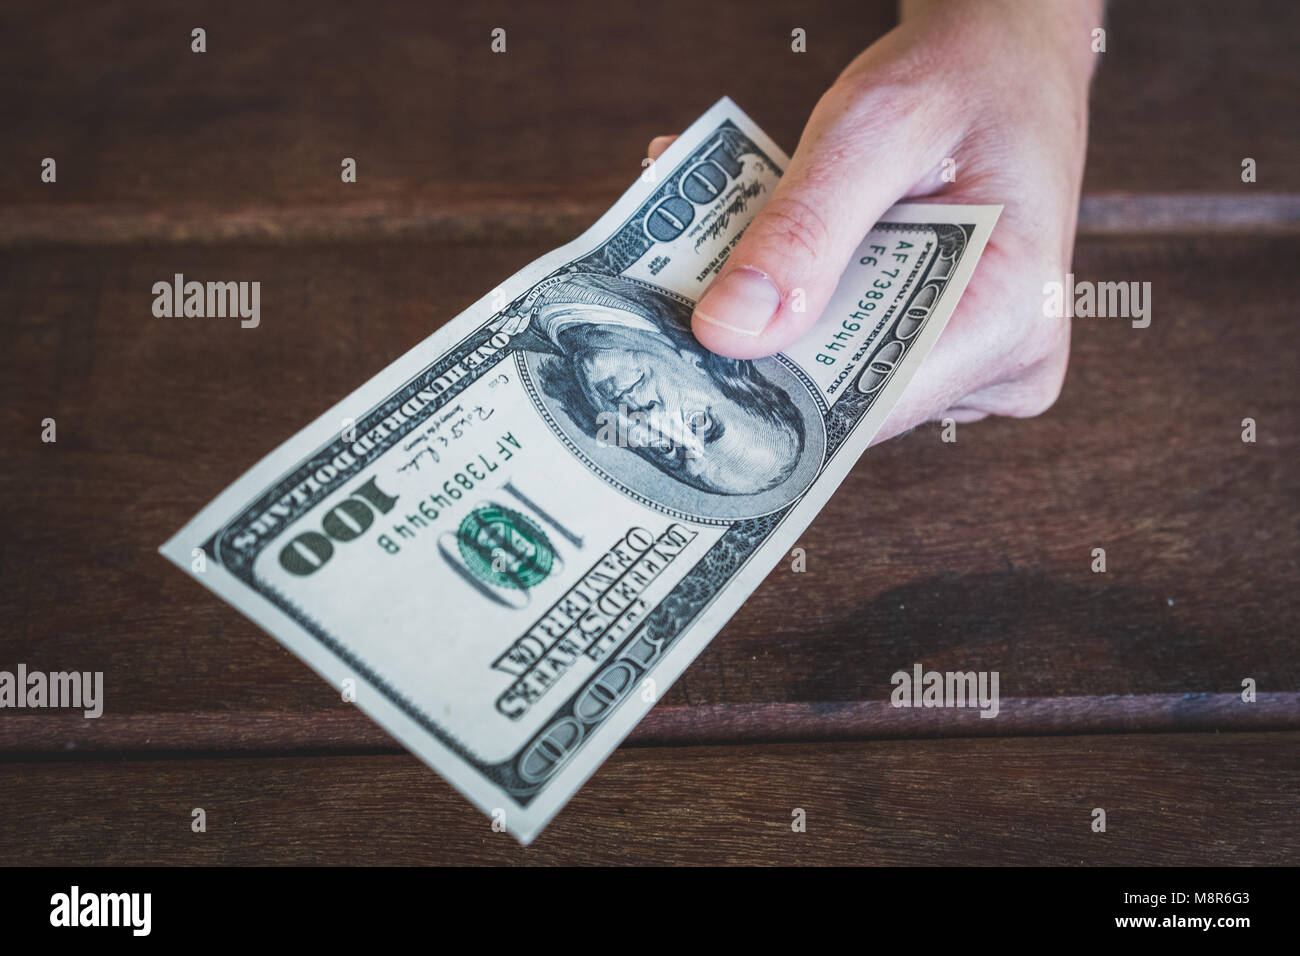 hundred dollars -  hand  holding 100 dollar bill - Stock Image